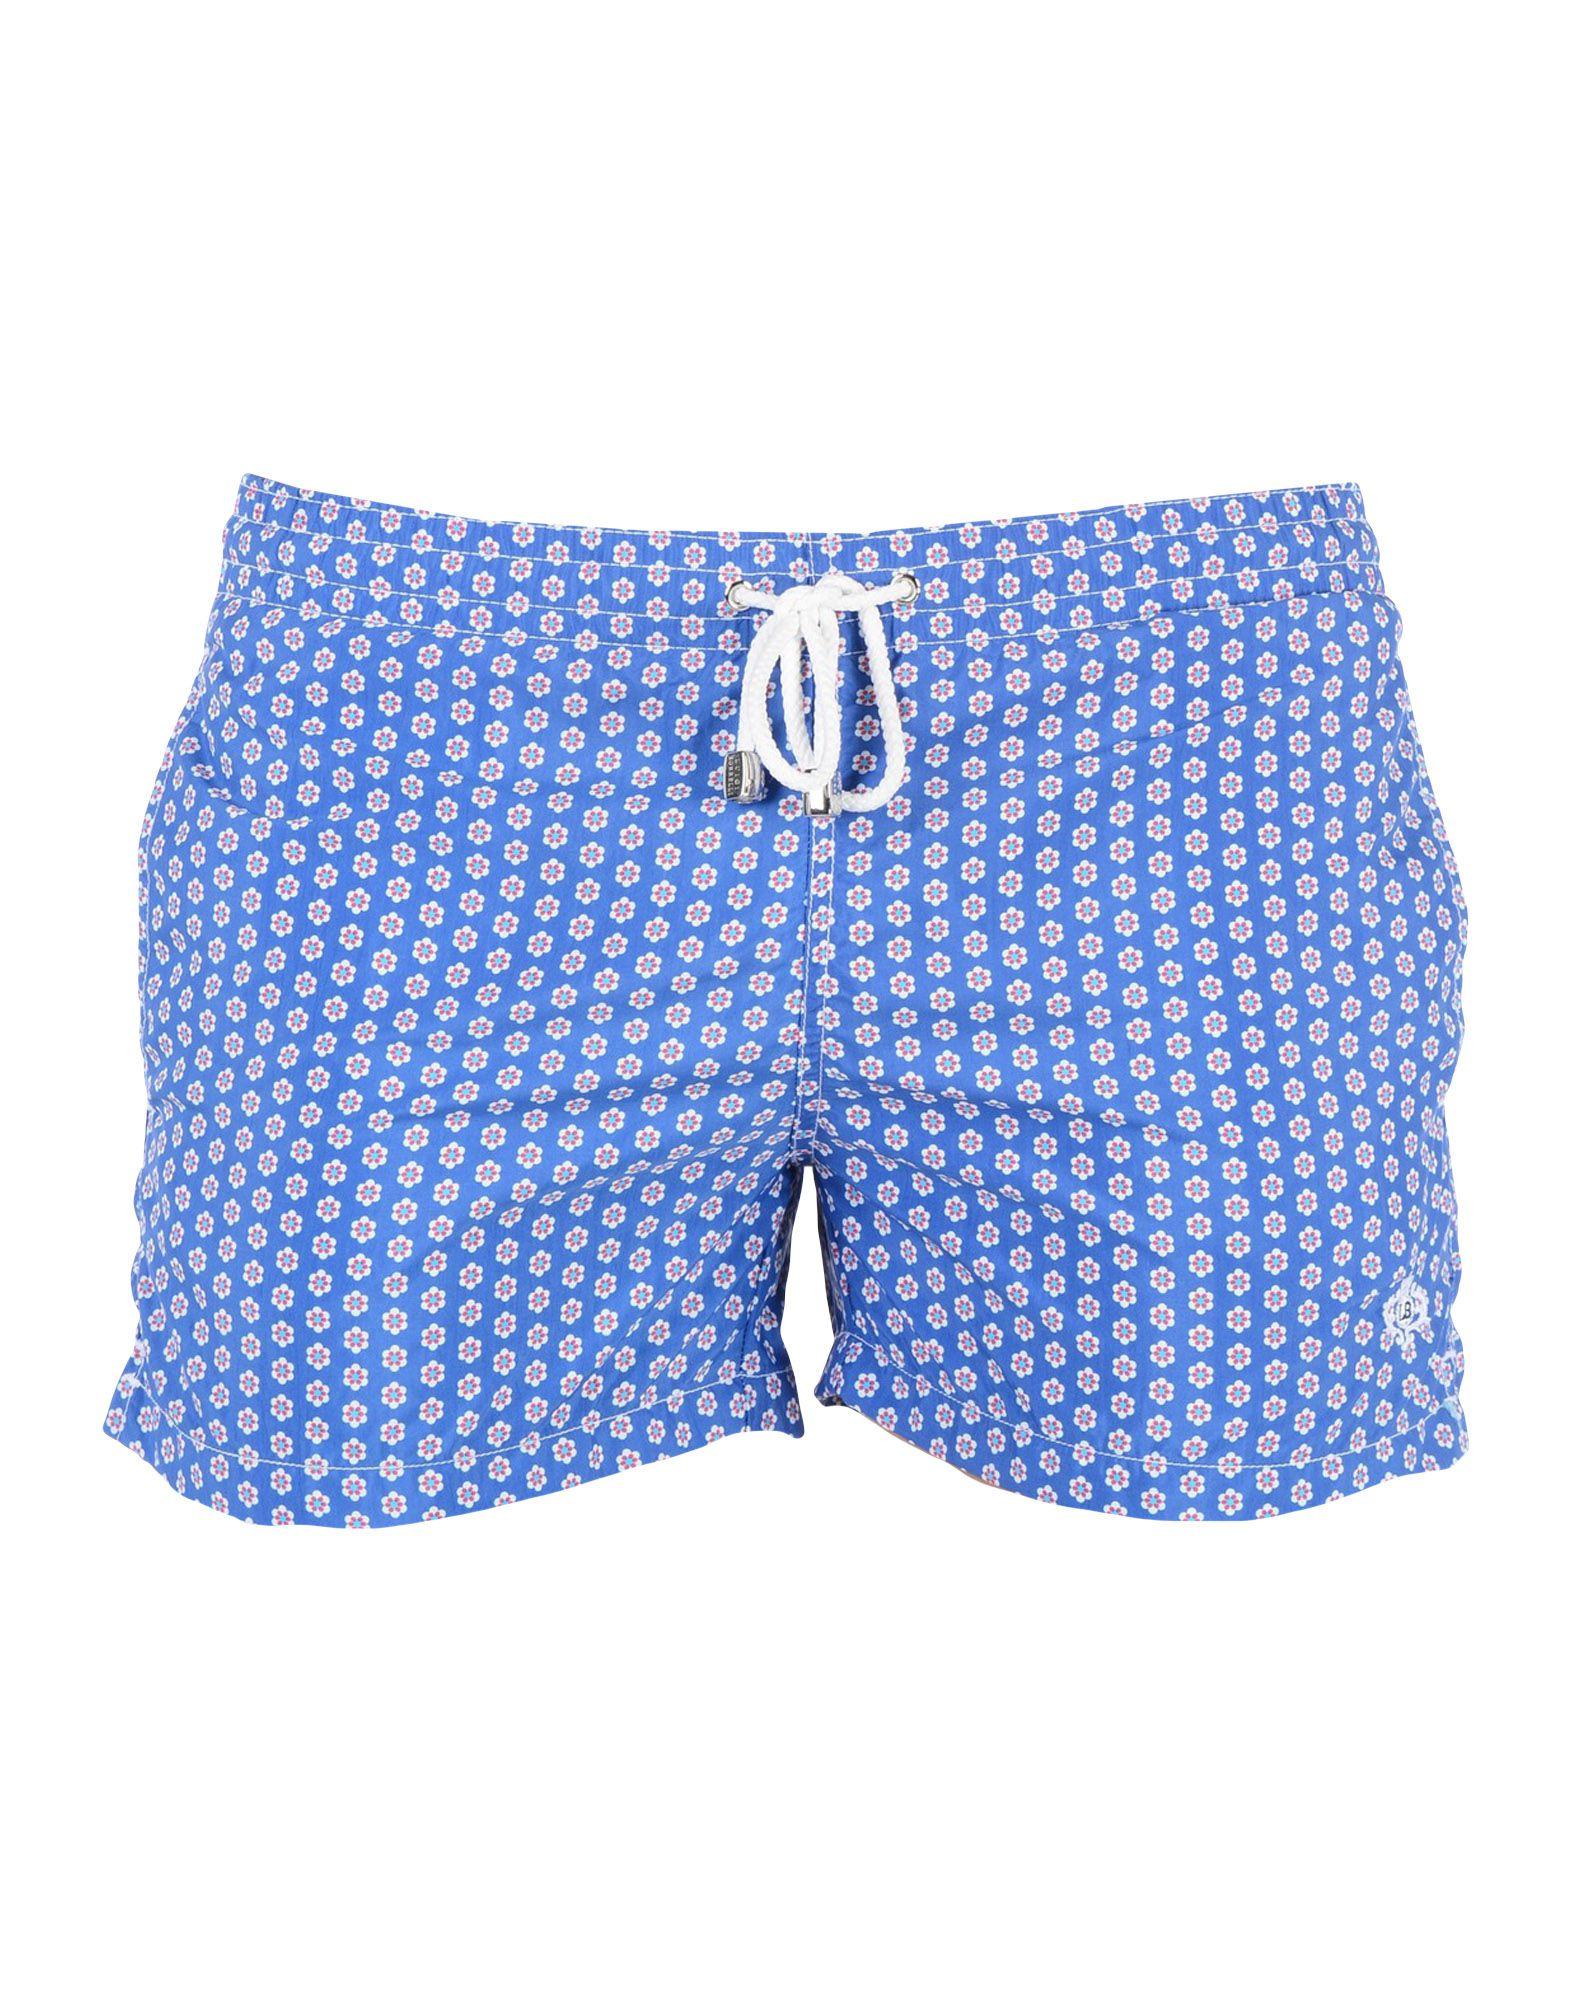 LUIGI BORRELLI NAPOLI Шорты для плавания короткие шорты для плавания quelle kangaroos 702972